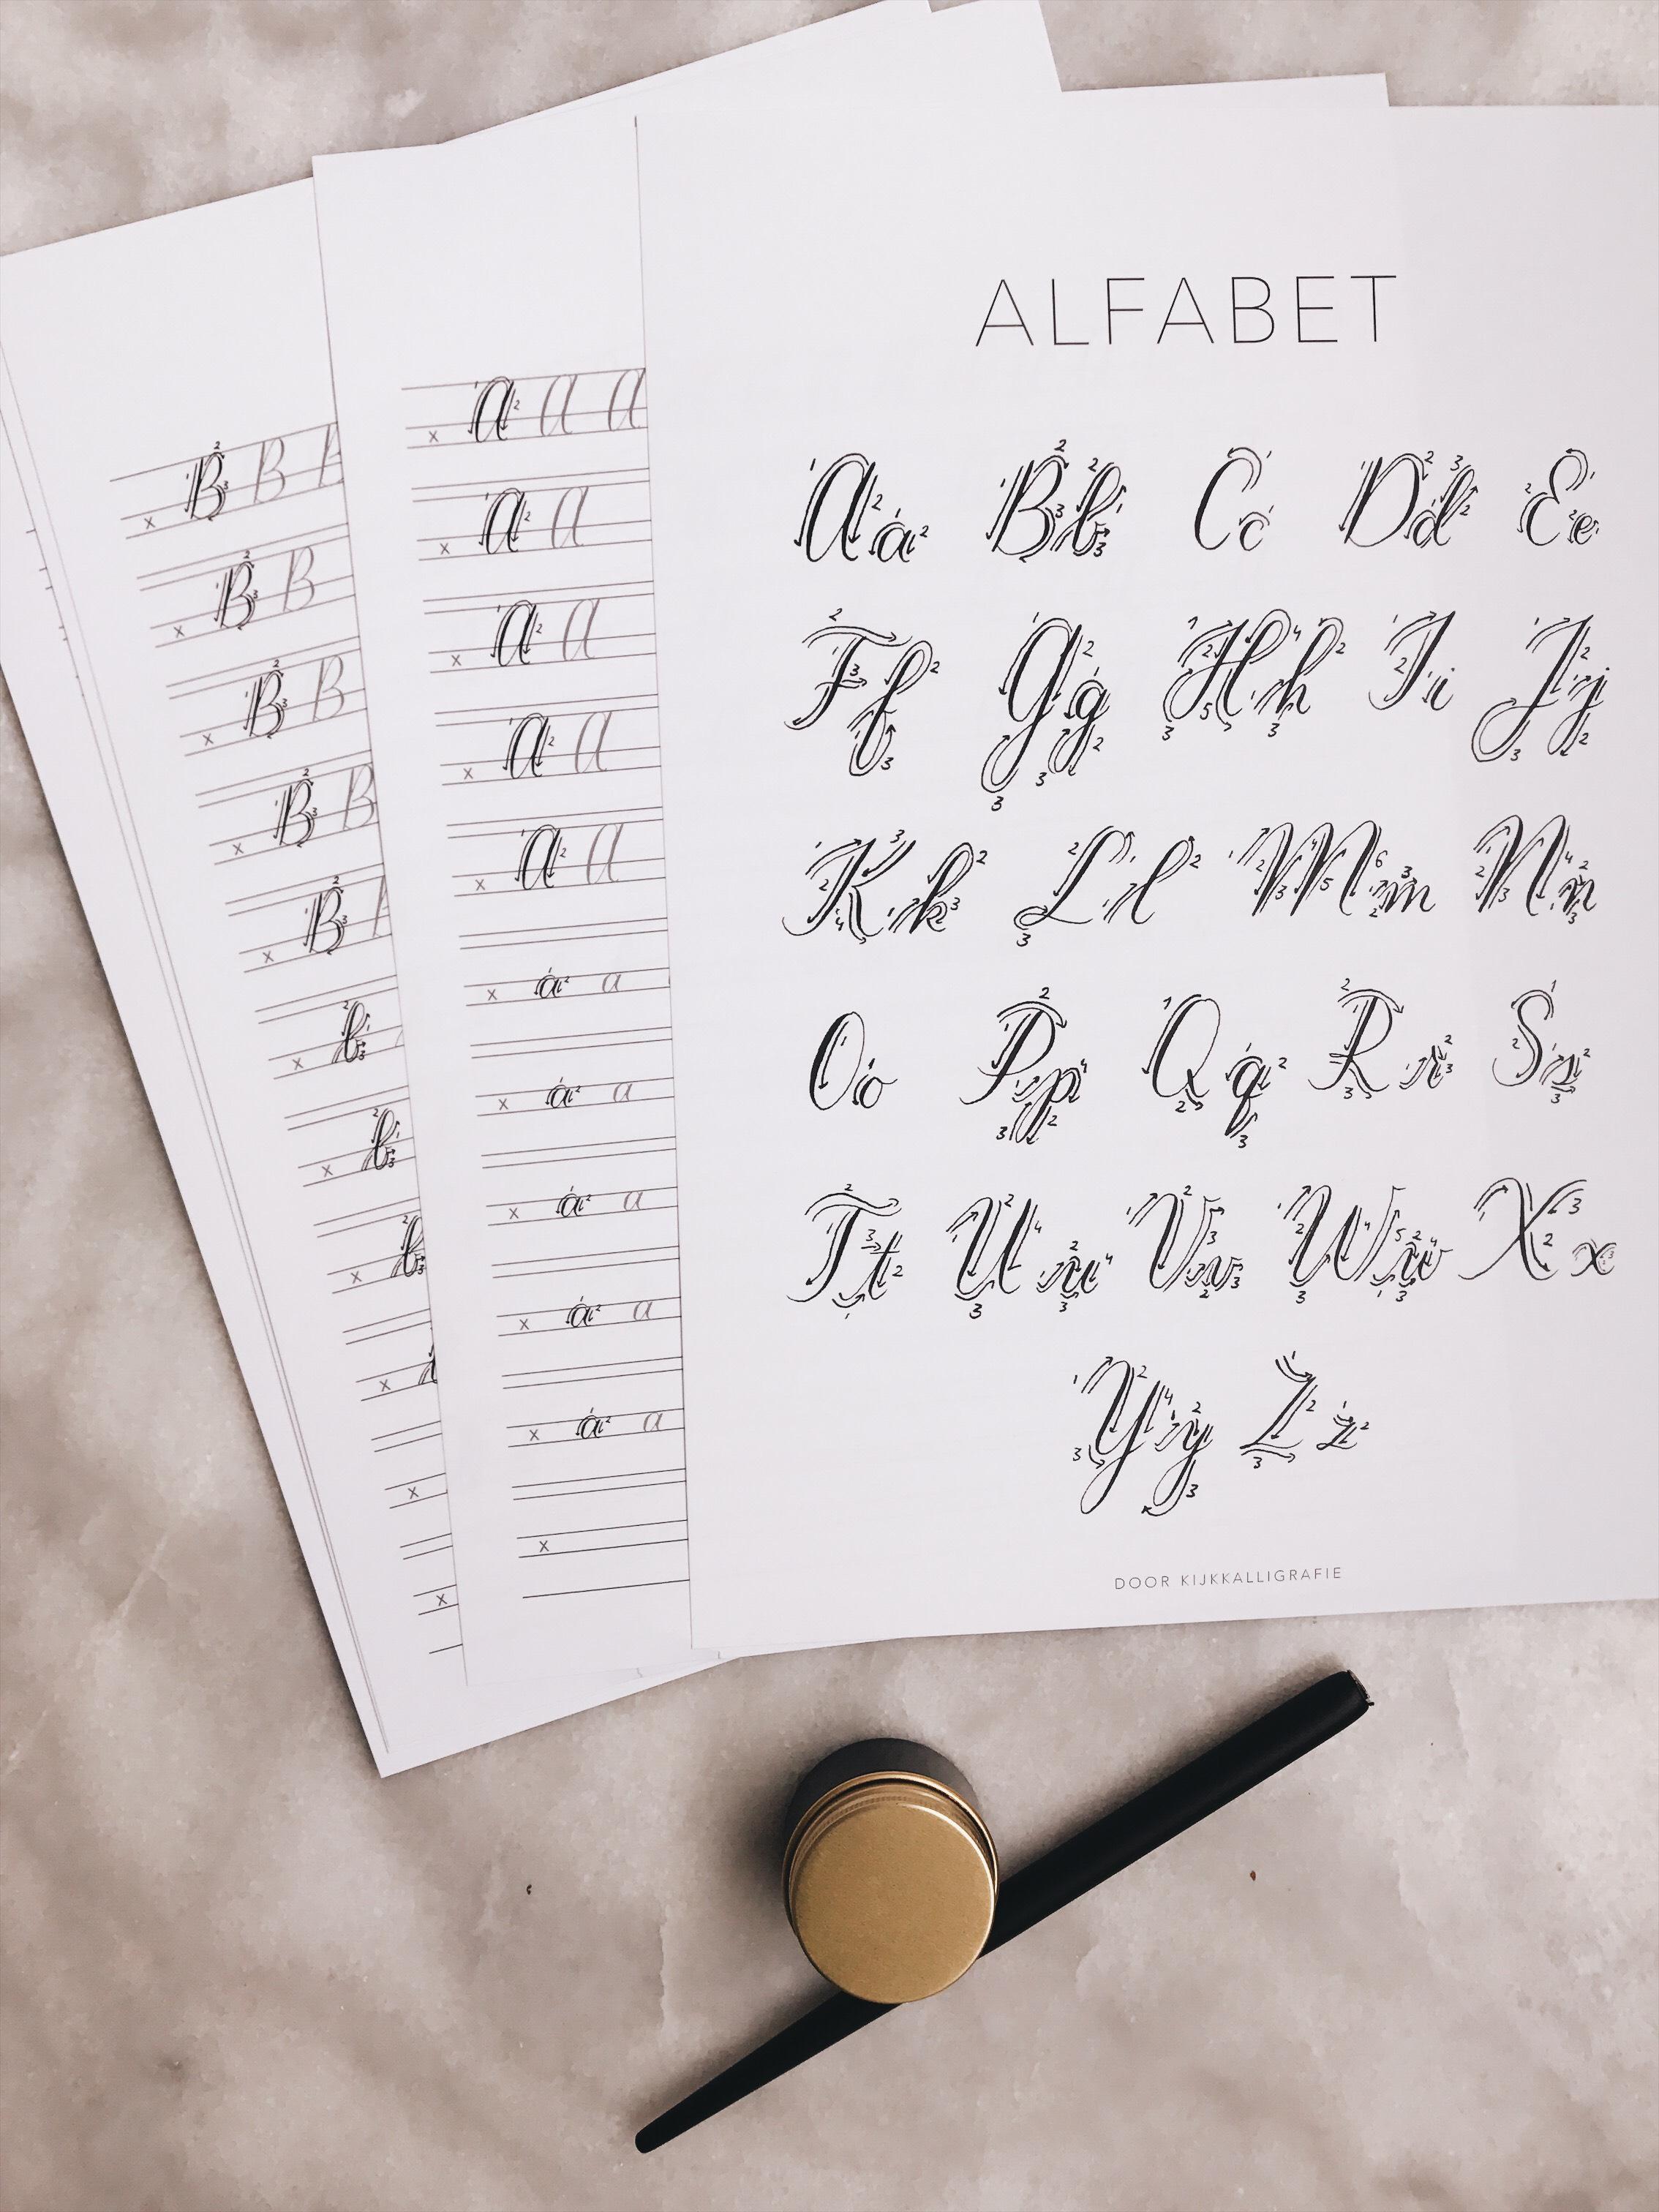 Oefenboek moderne kalligrafie masterclass alfabet